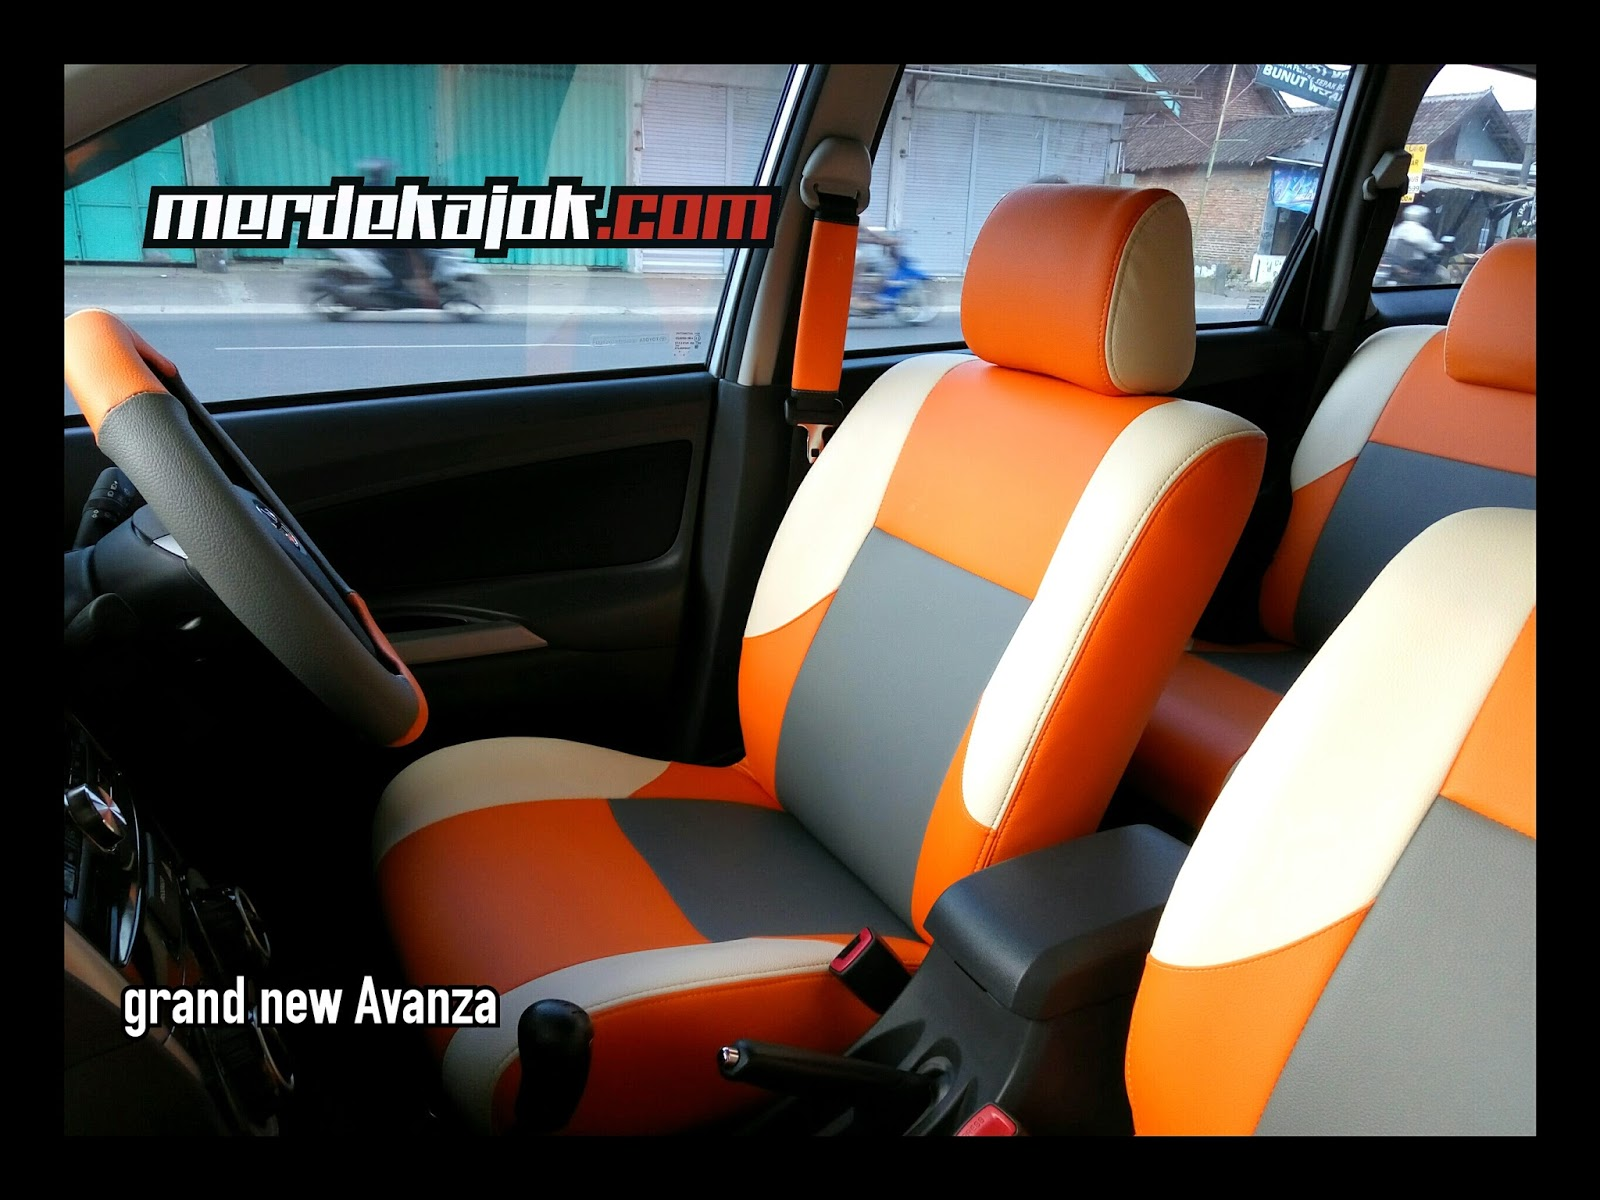 cover jok grand new avanza veloz 1.3 matic mobil malang merdekajok orange gray cream